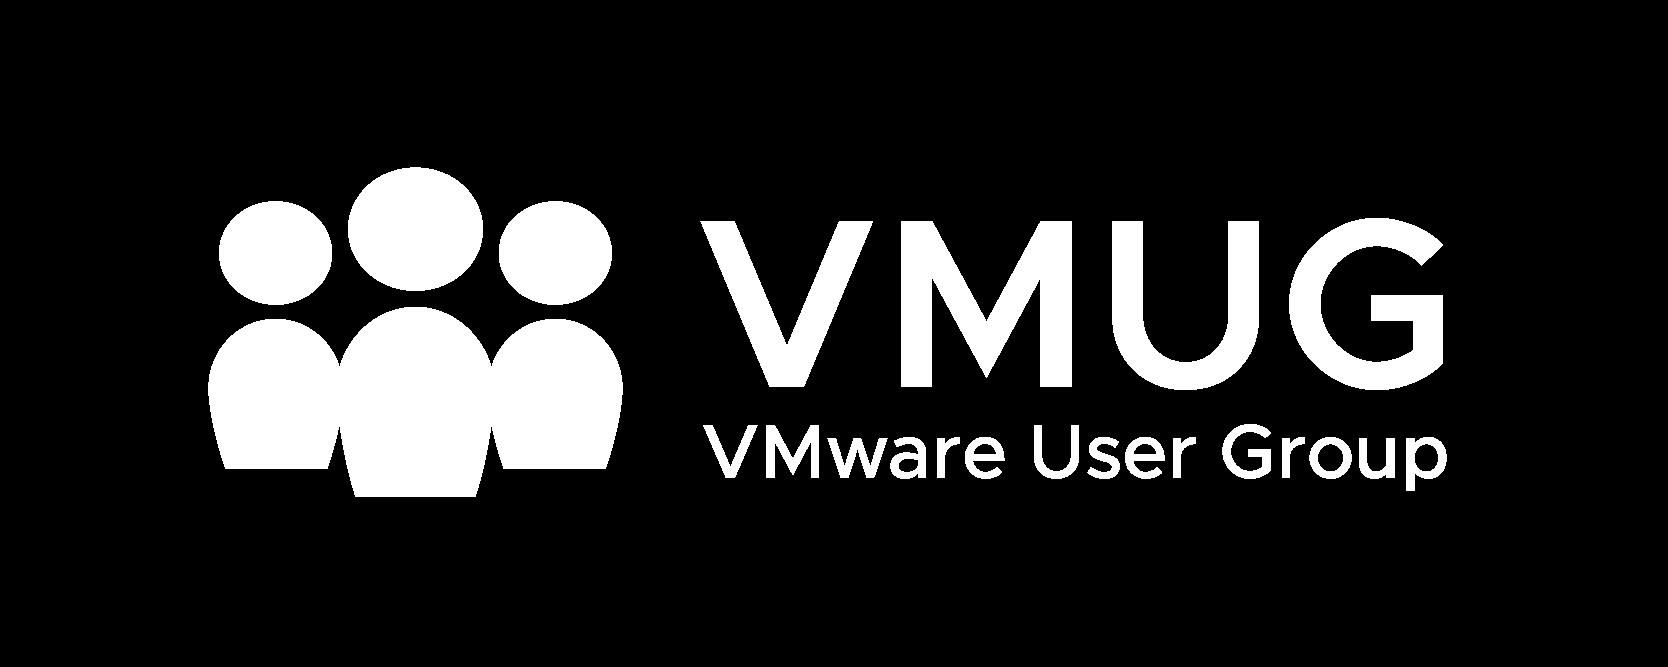 vmug-white.png